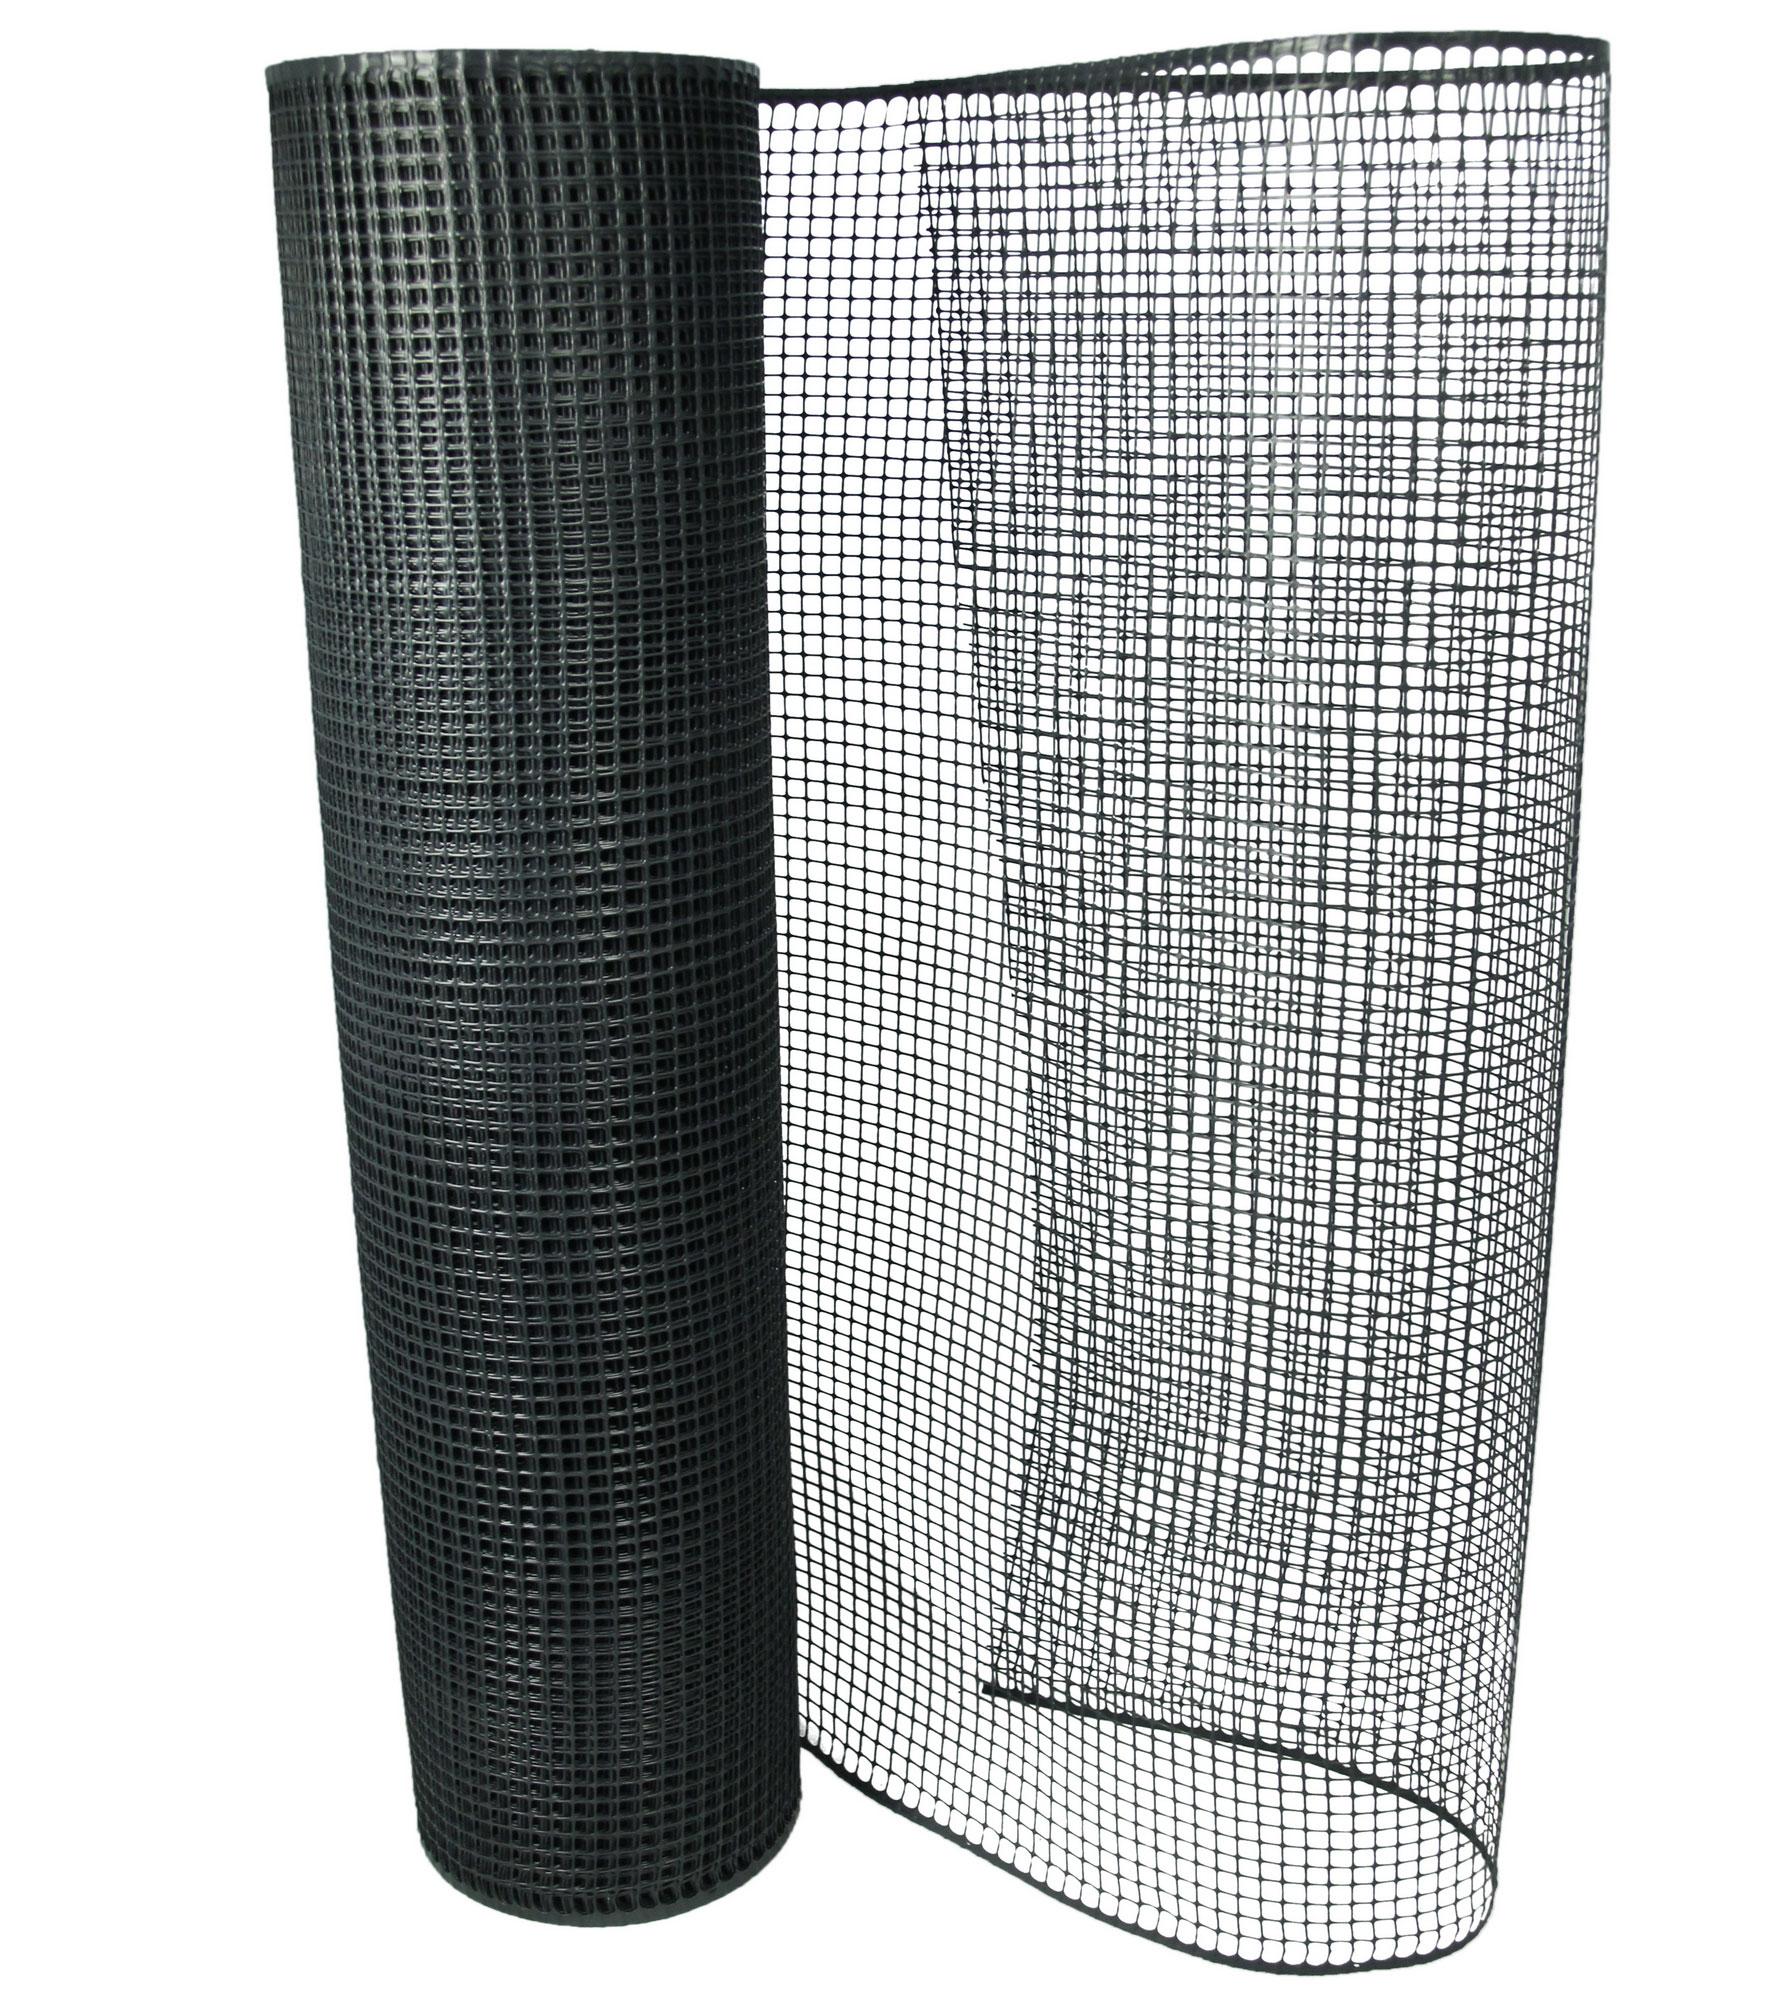 Maulwurfgitter / Maulwurfblocker Noor 1,2x50m 320g/m² Bild 1